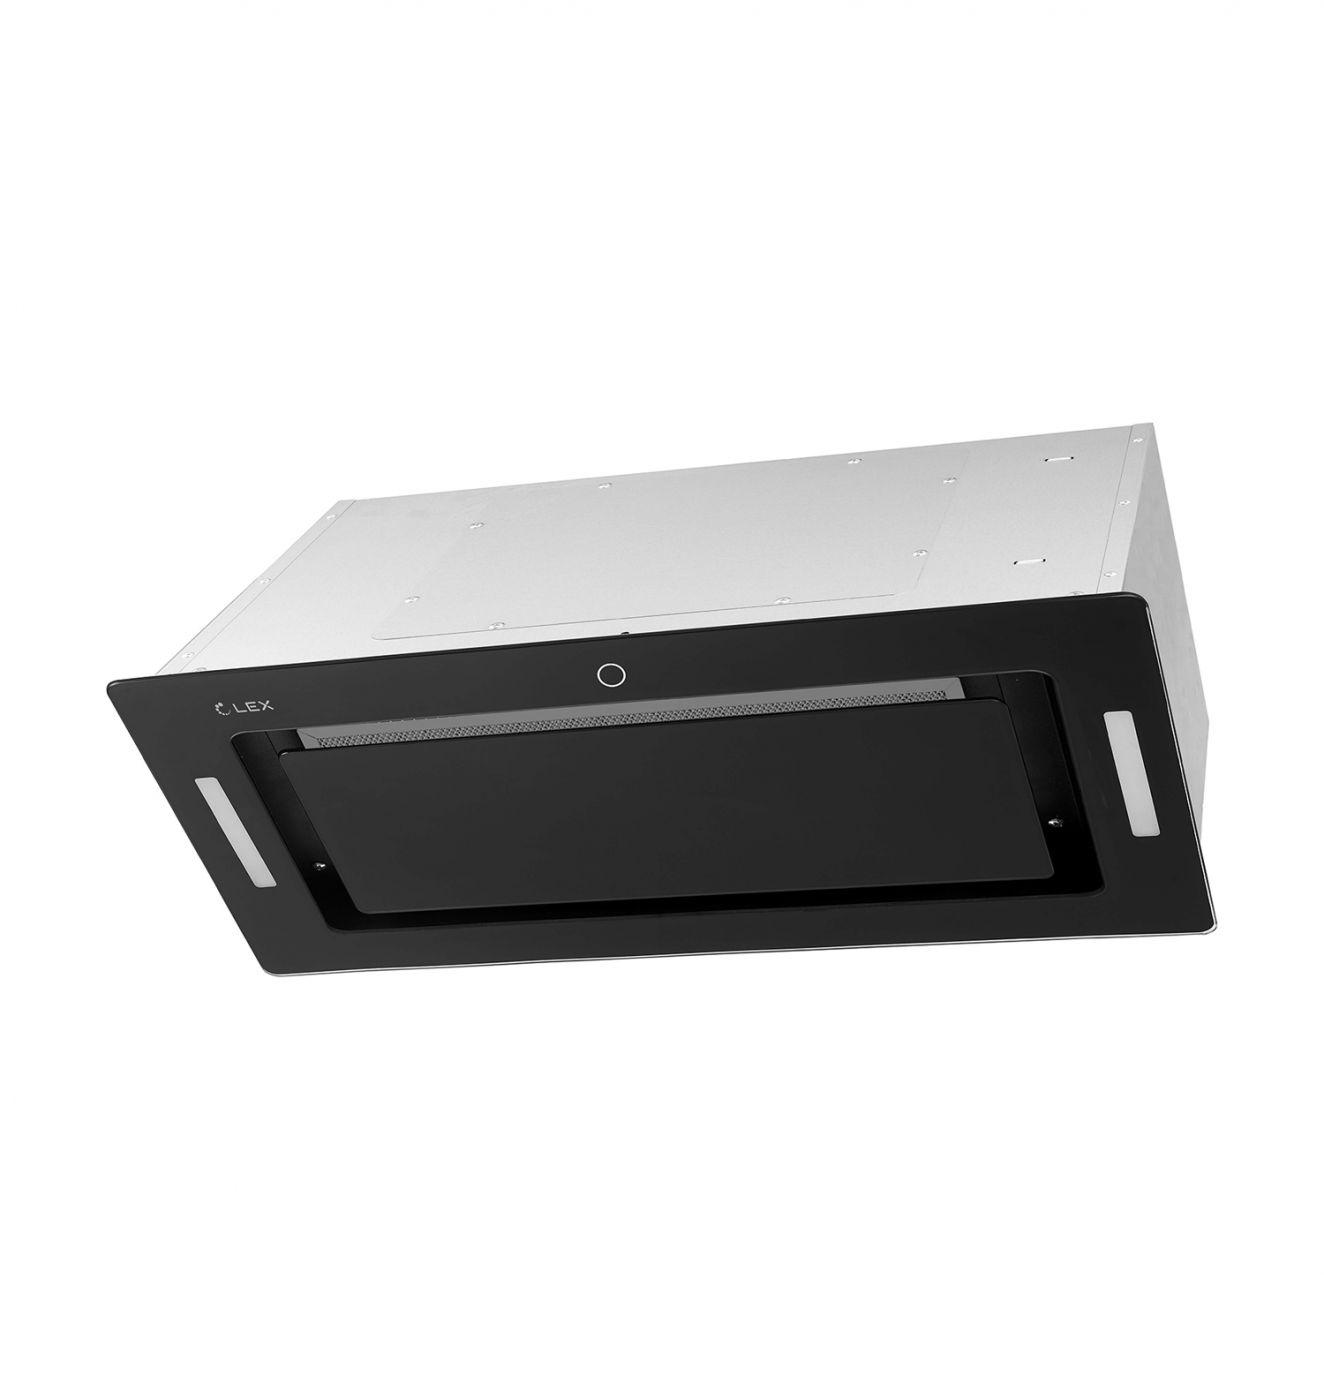 Встраиваемая вытяжка LEX GS BLOC Gs 900 black CHTI000363